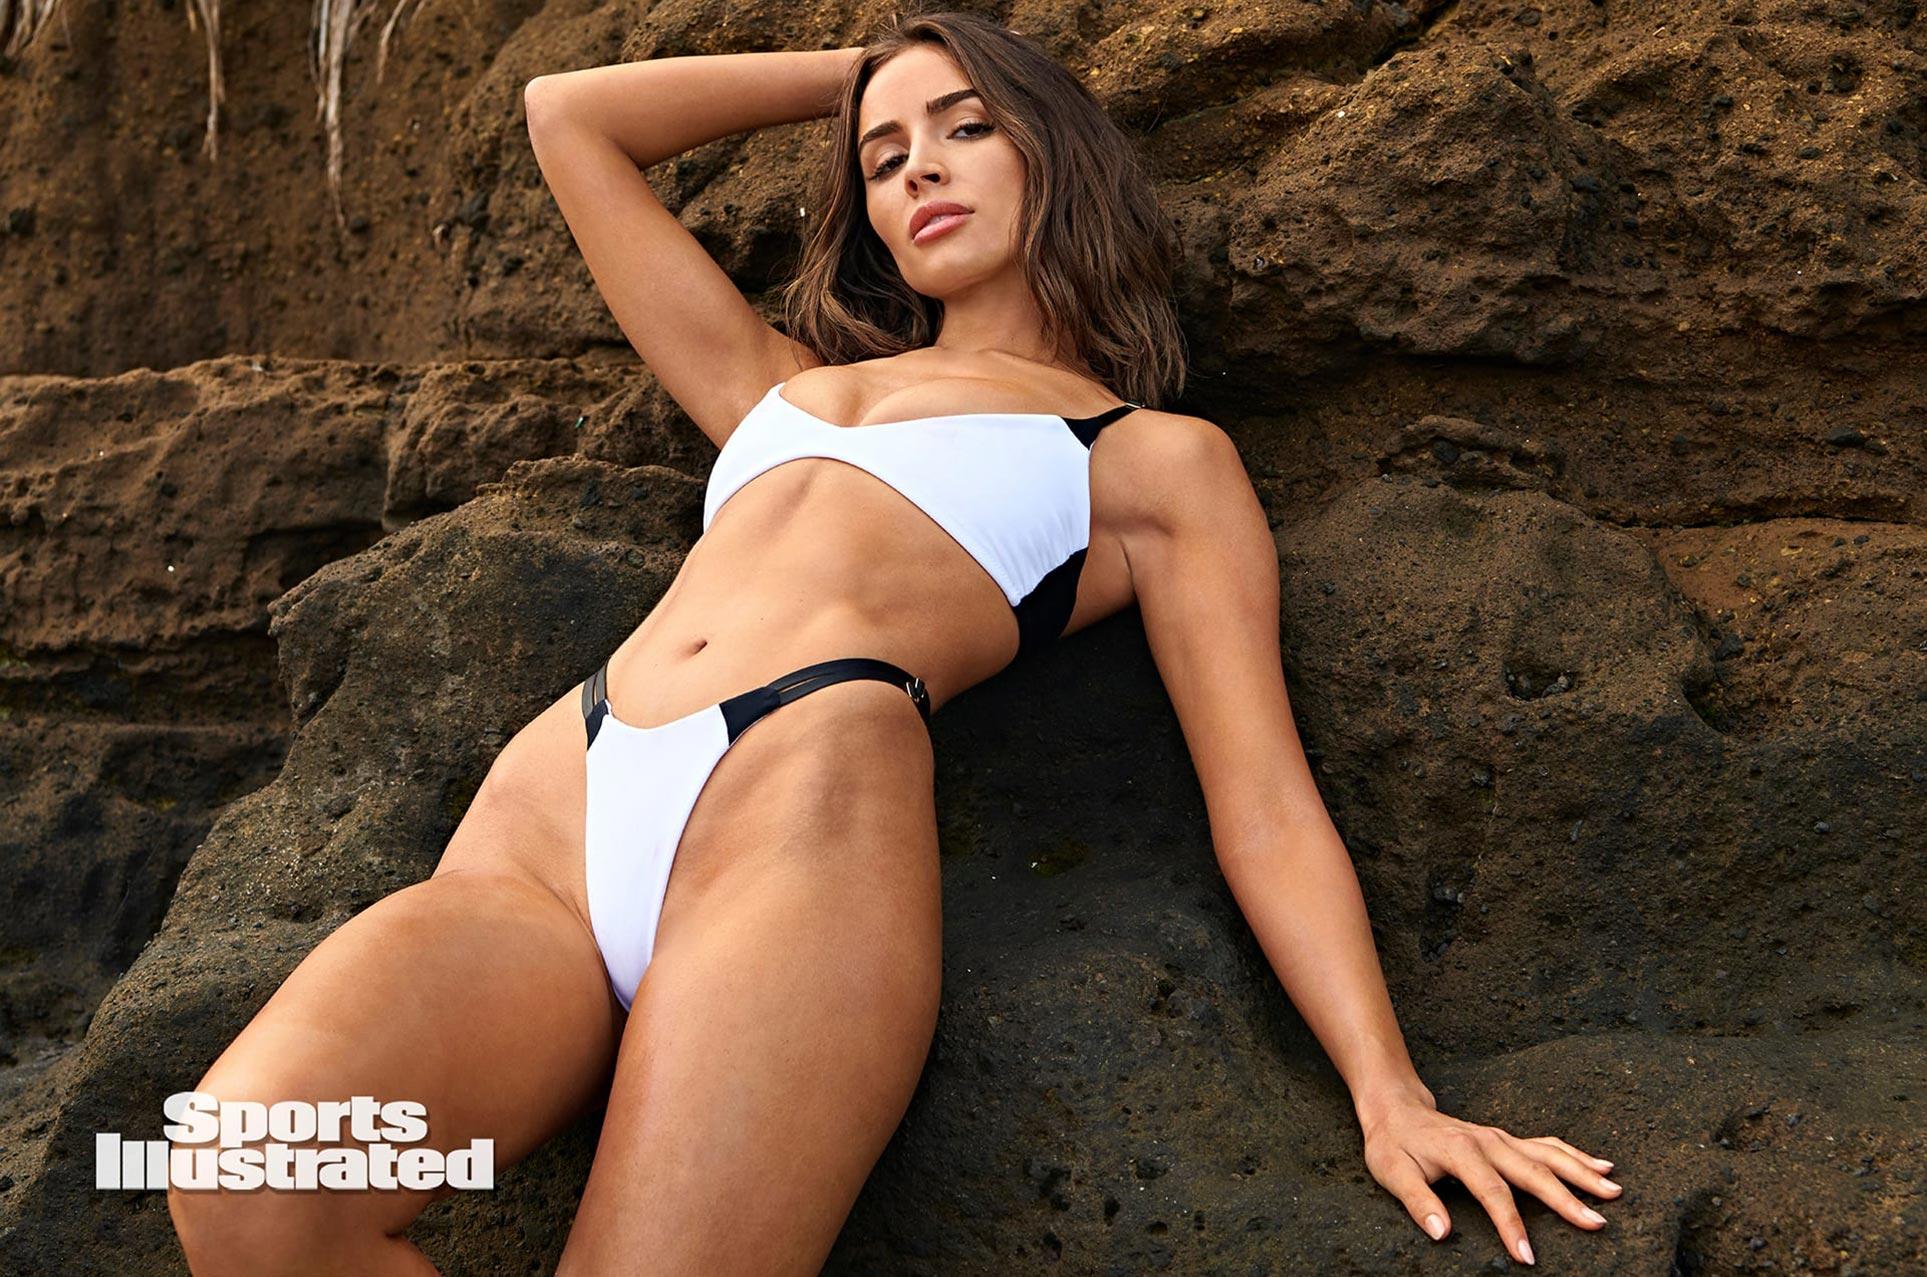 Оливия Калпо в каталоге купальников Sports Illustrated Swimsuit 2020 / фото 23